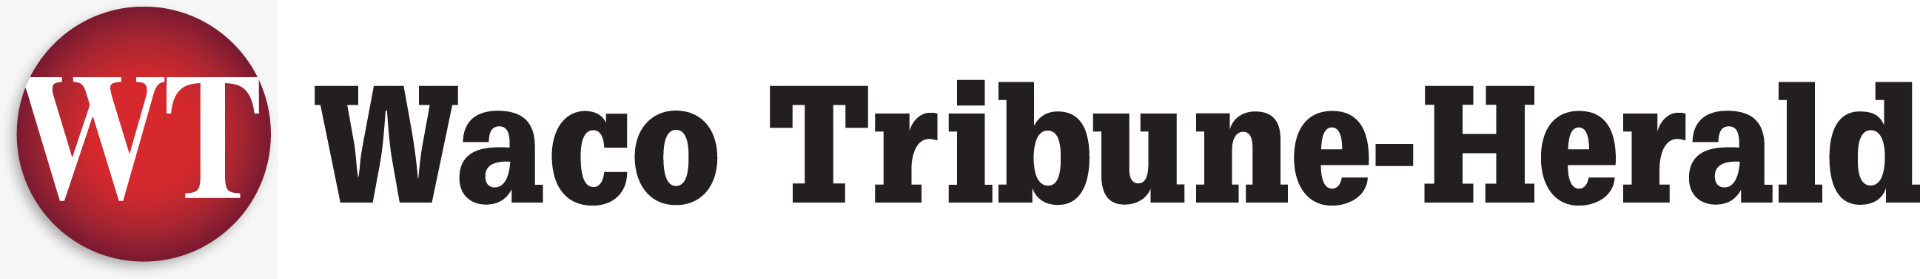 WacoTrib-Logo-Solo.png